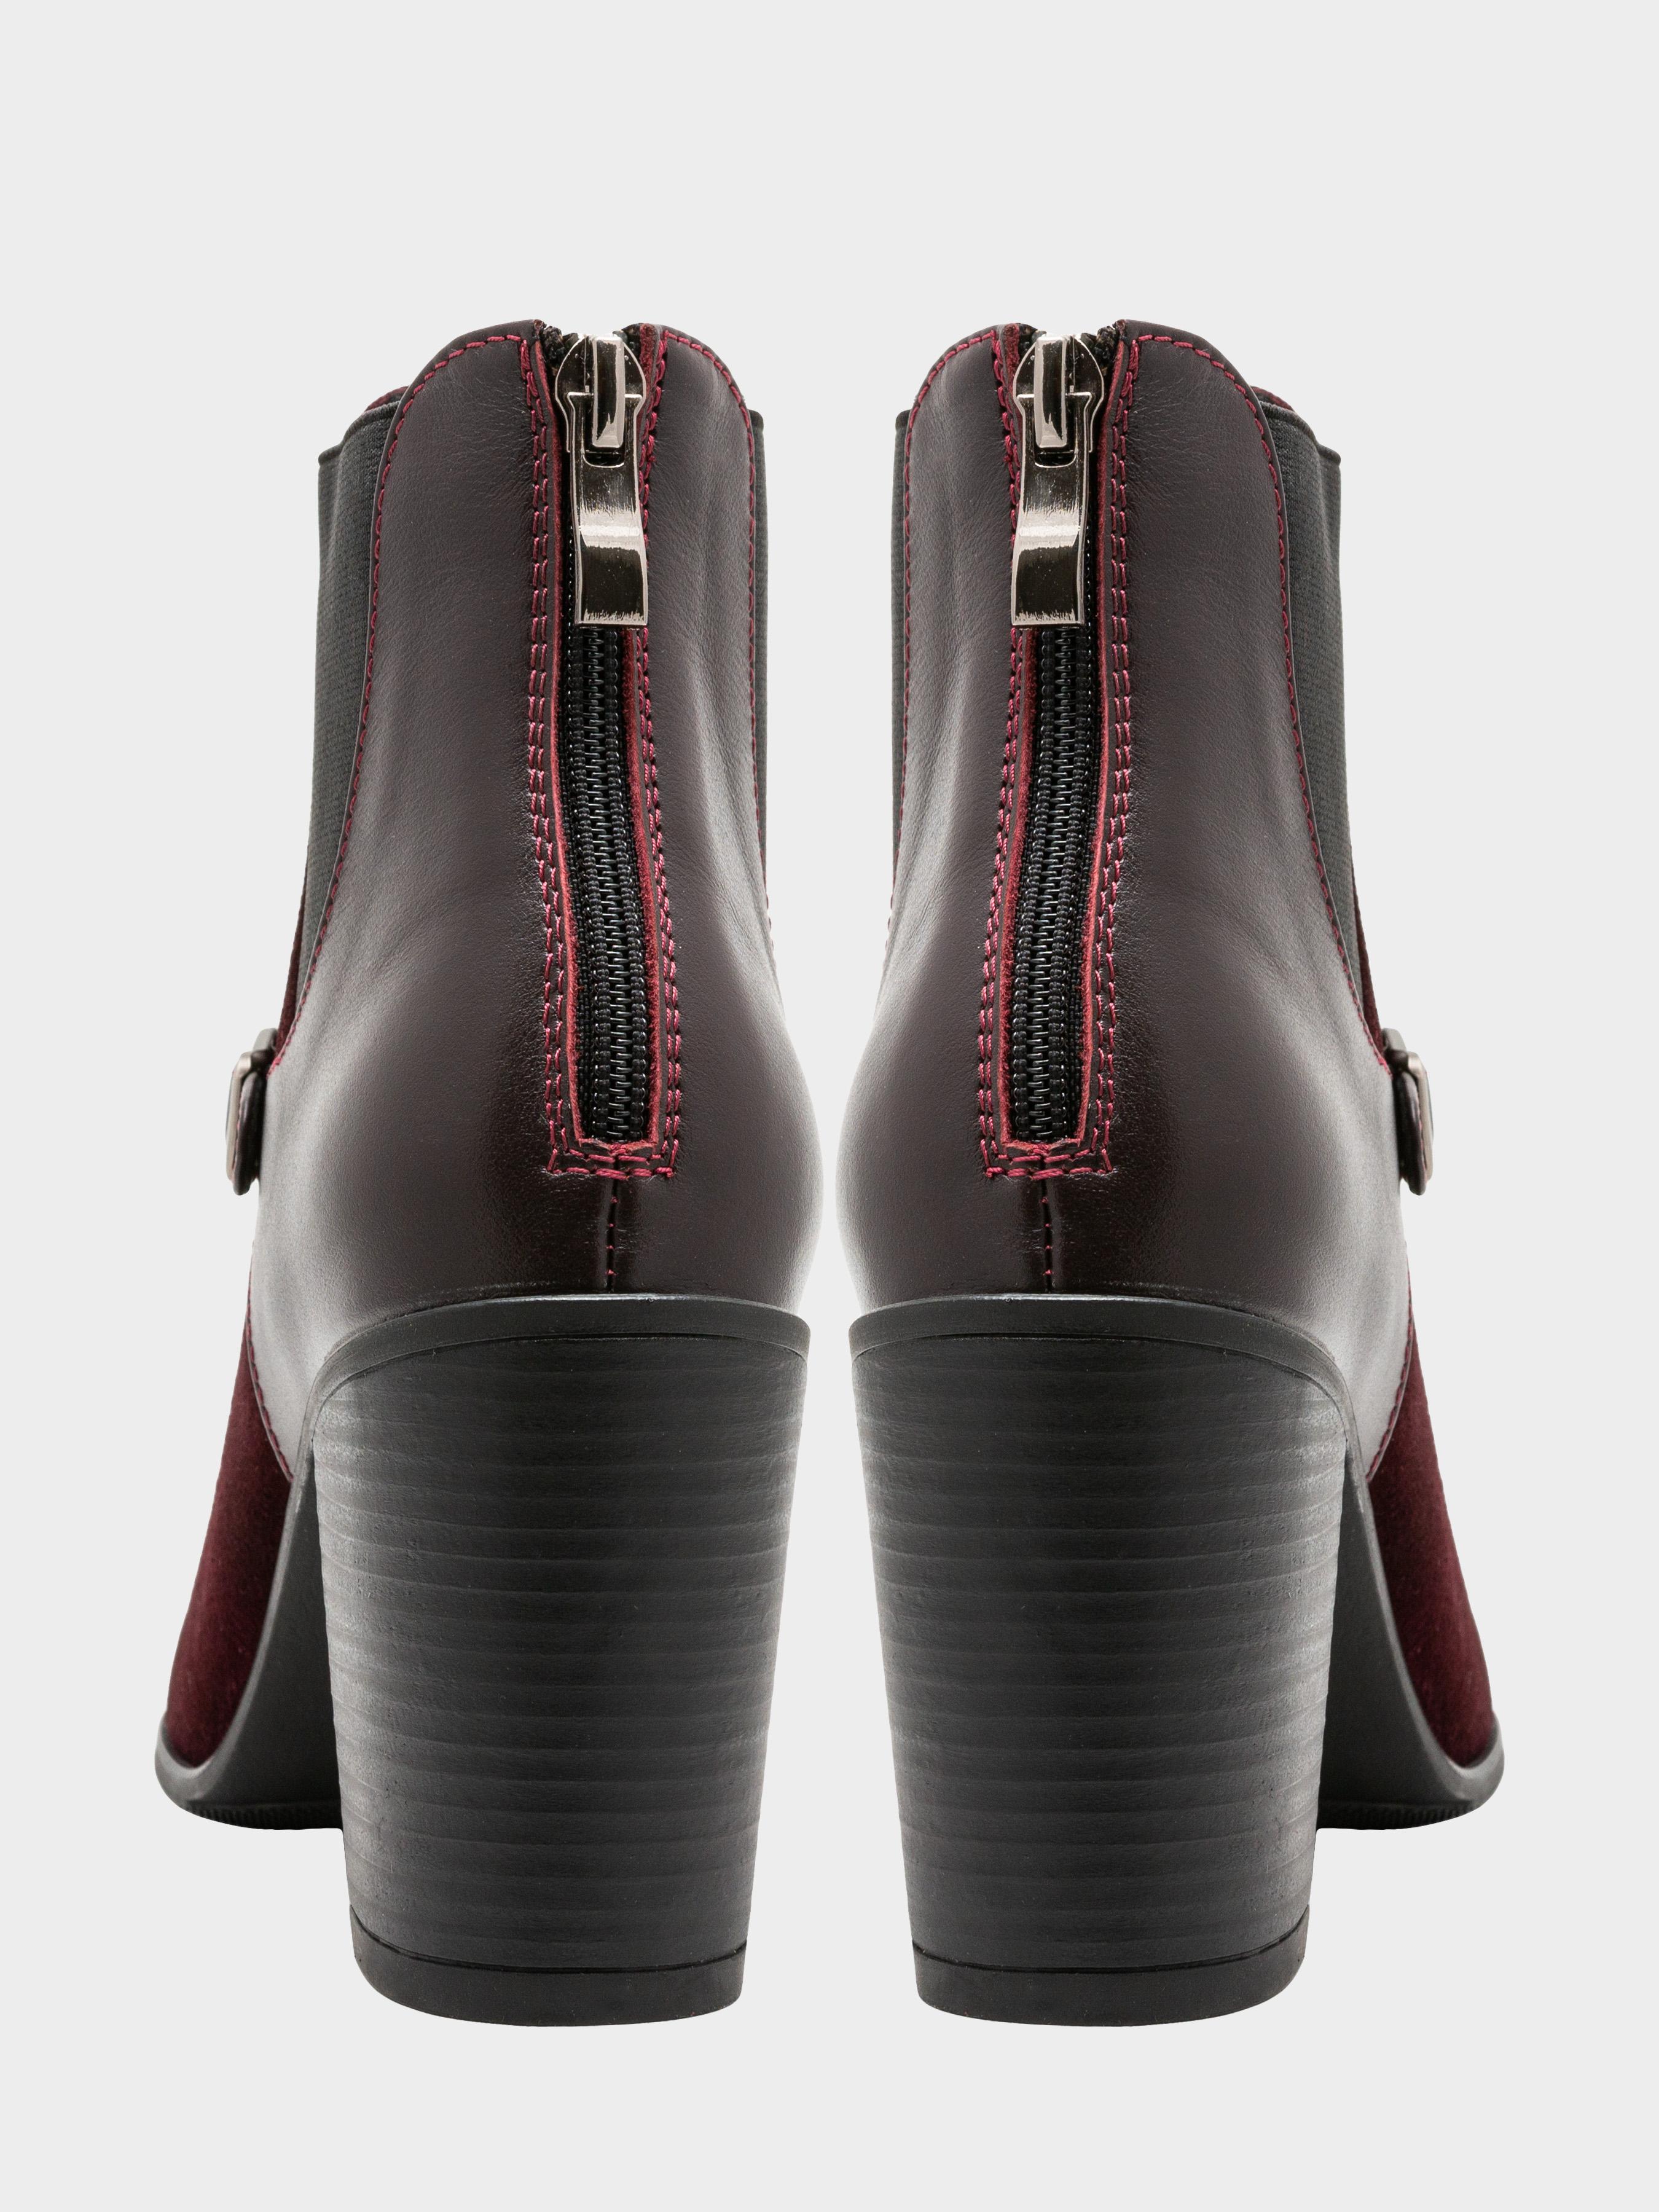 Ботинки для женщин Ботинки женские ENZO VERRATTI 18-9695-2bo примерка, 2017